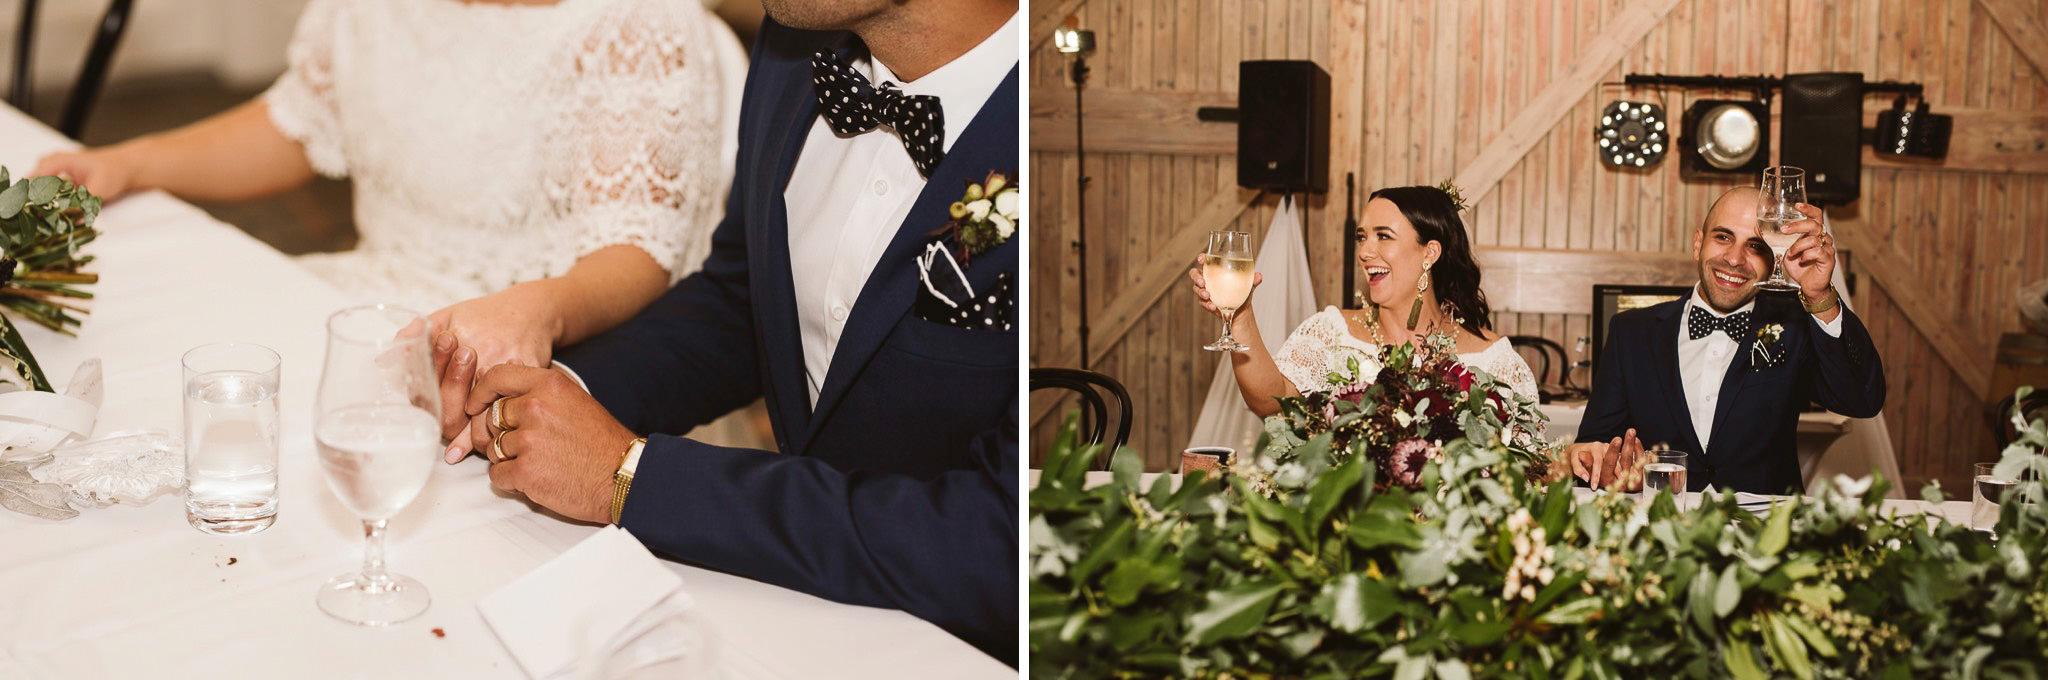 The Farm Yarra Valley Wedding Photography Ashleigh Haase-78.jpg